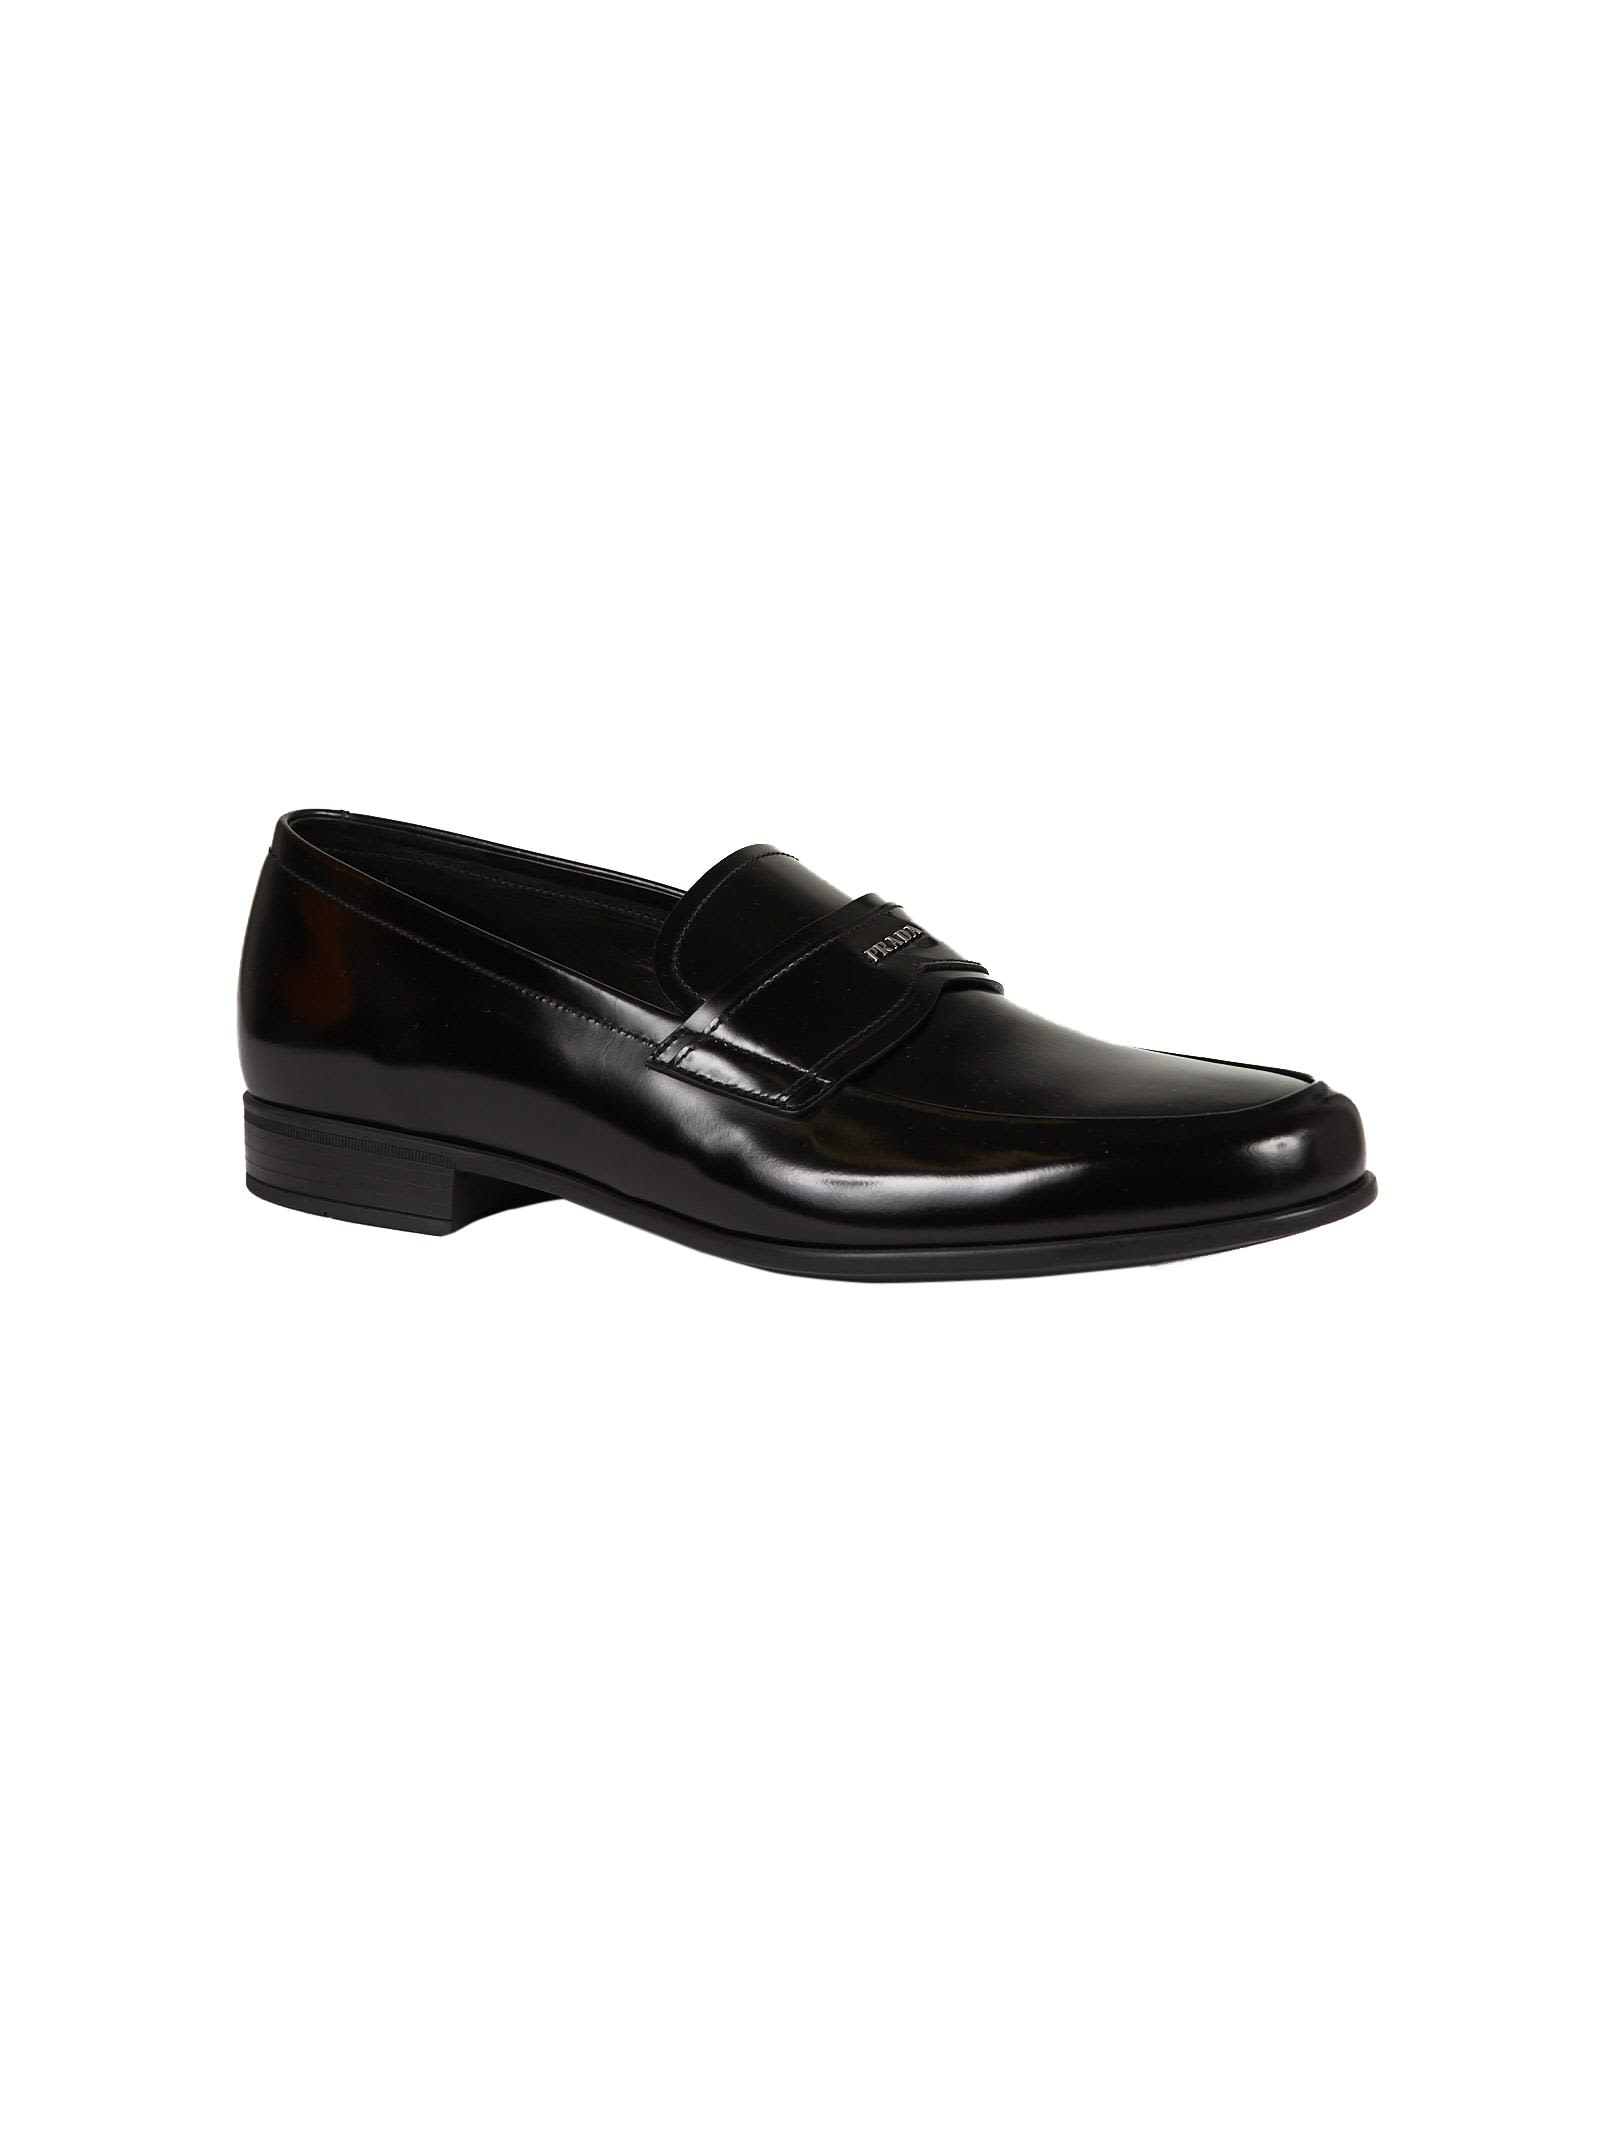 Prada classic derby shoes discount find great cheap sale authentic discount authentic KBLsl